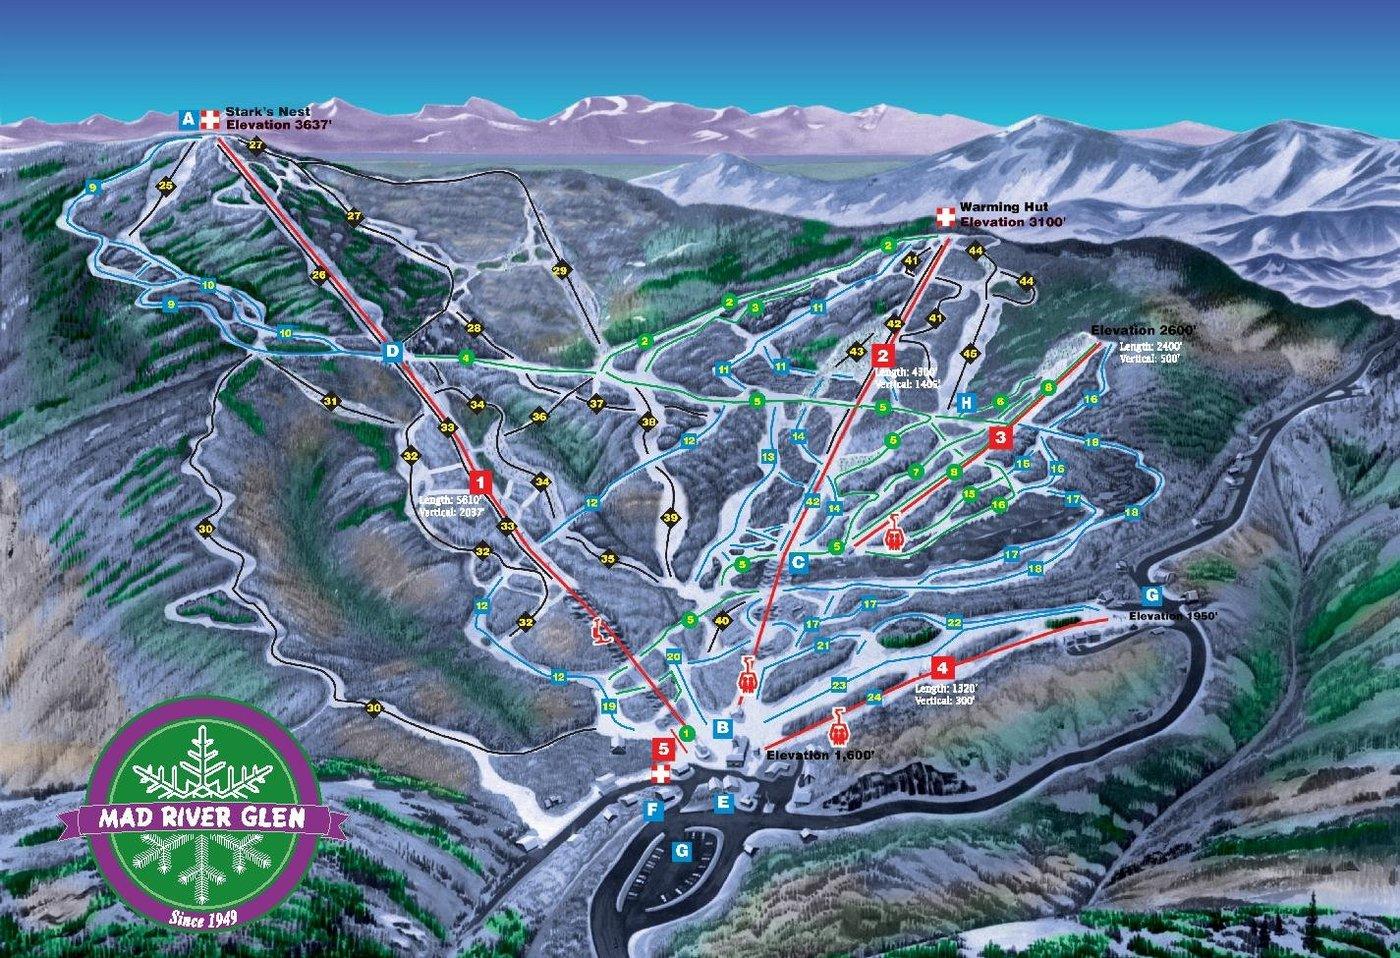 Mad River Glen Trail Map